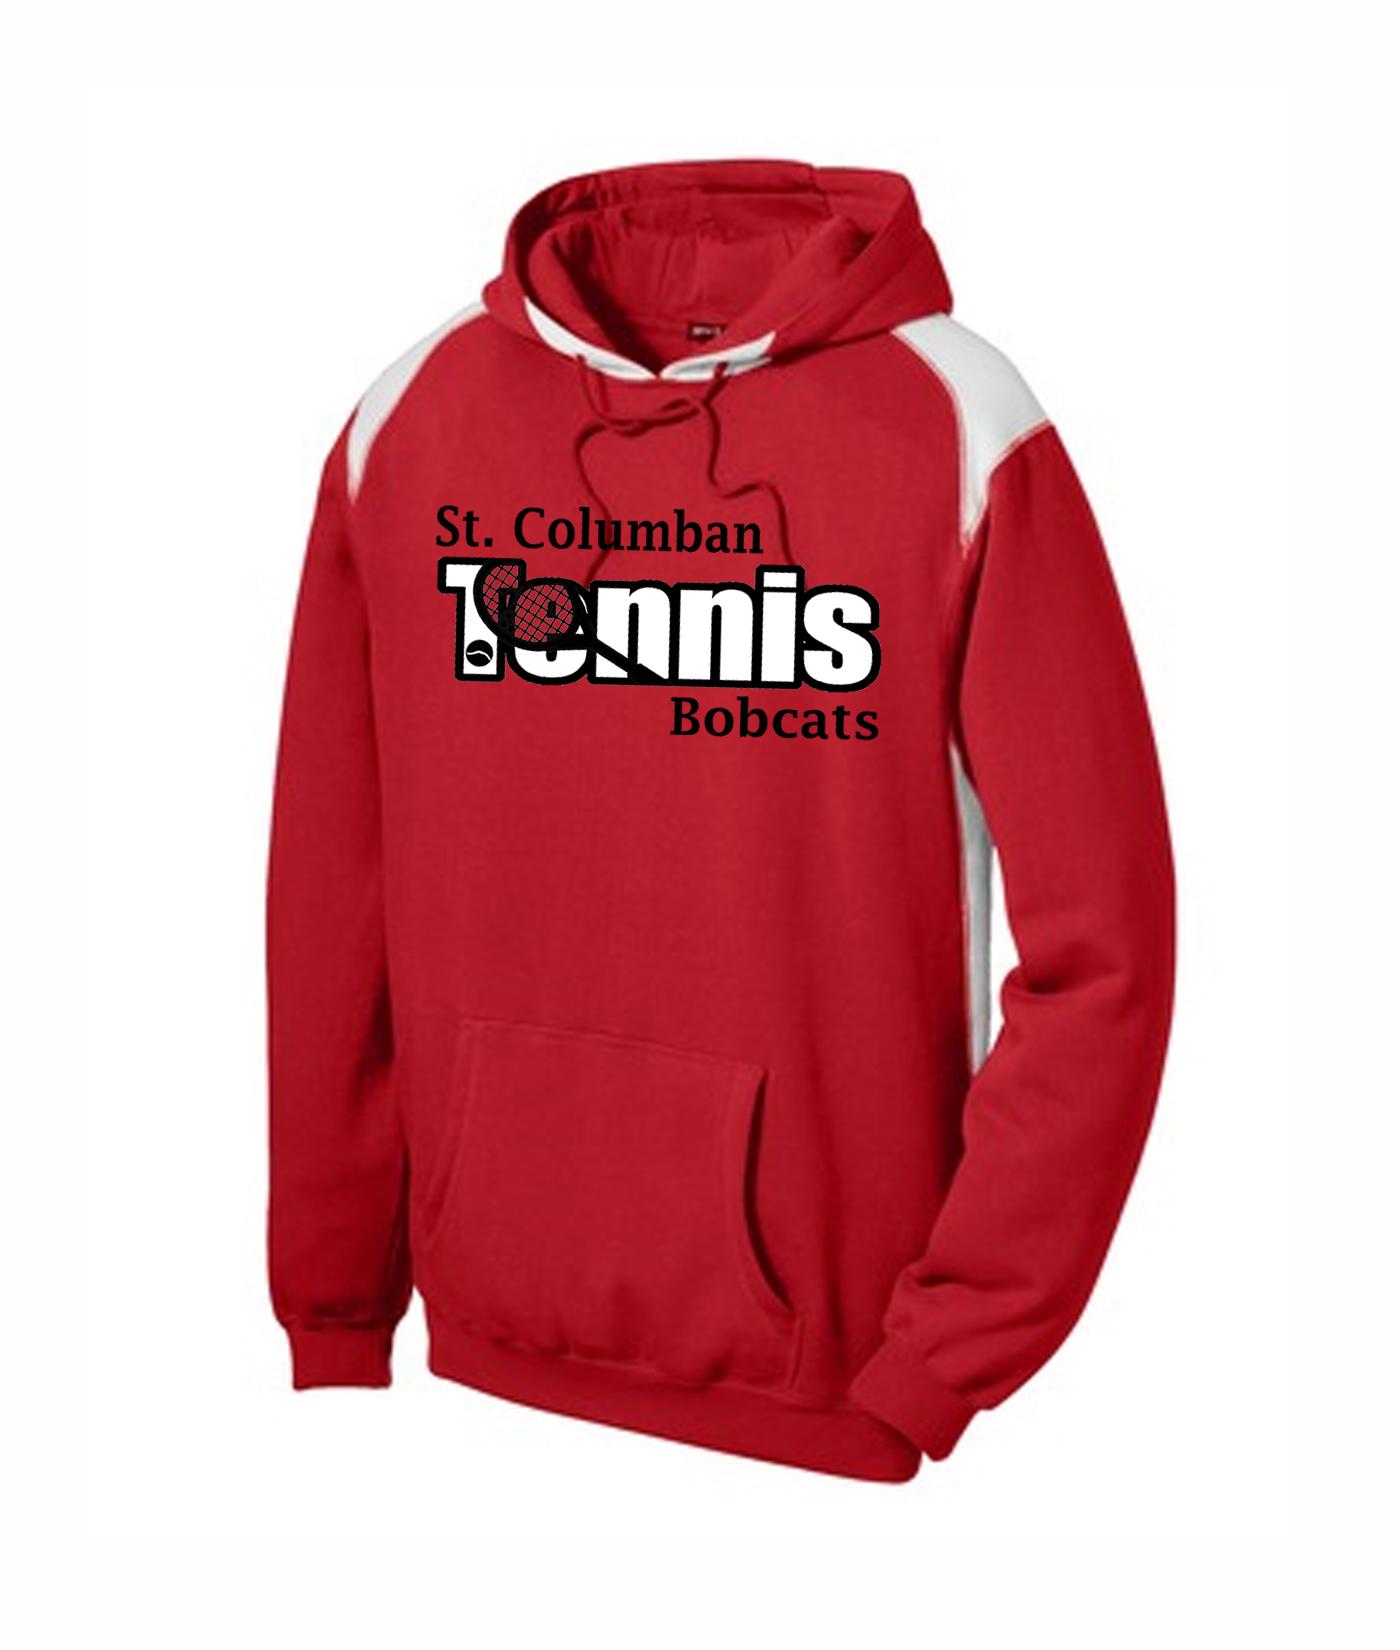 St. Columban Bobcats Tennis Red Multi Color Hoodie